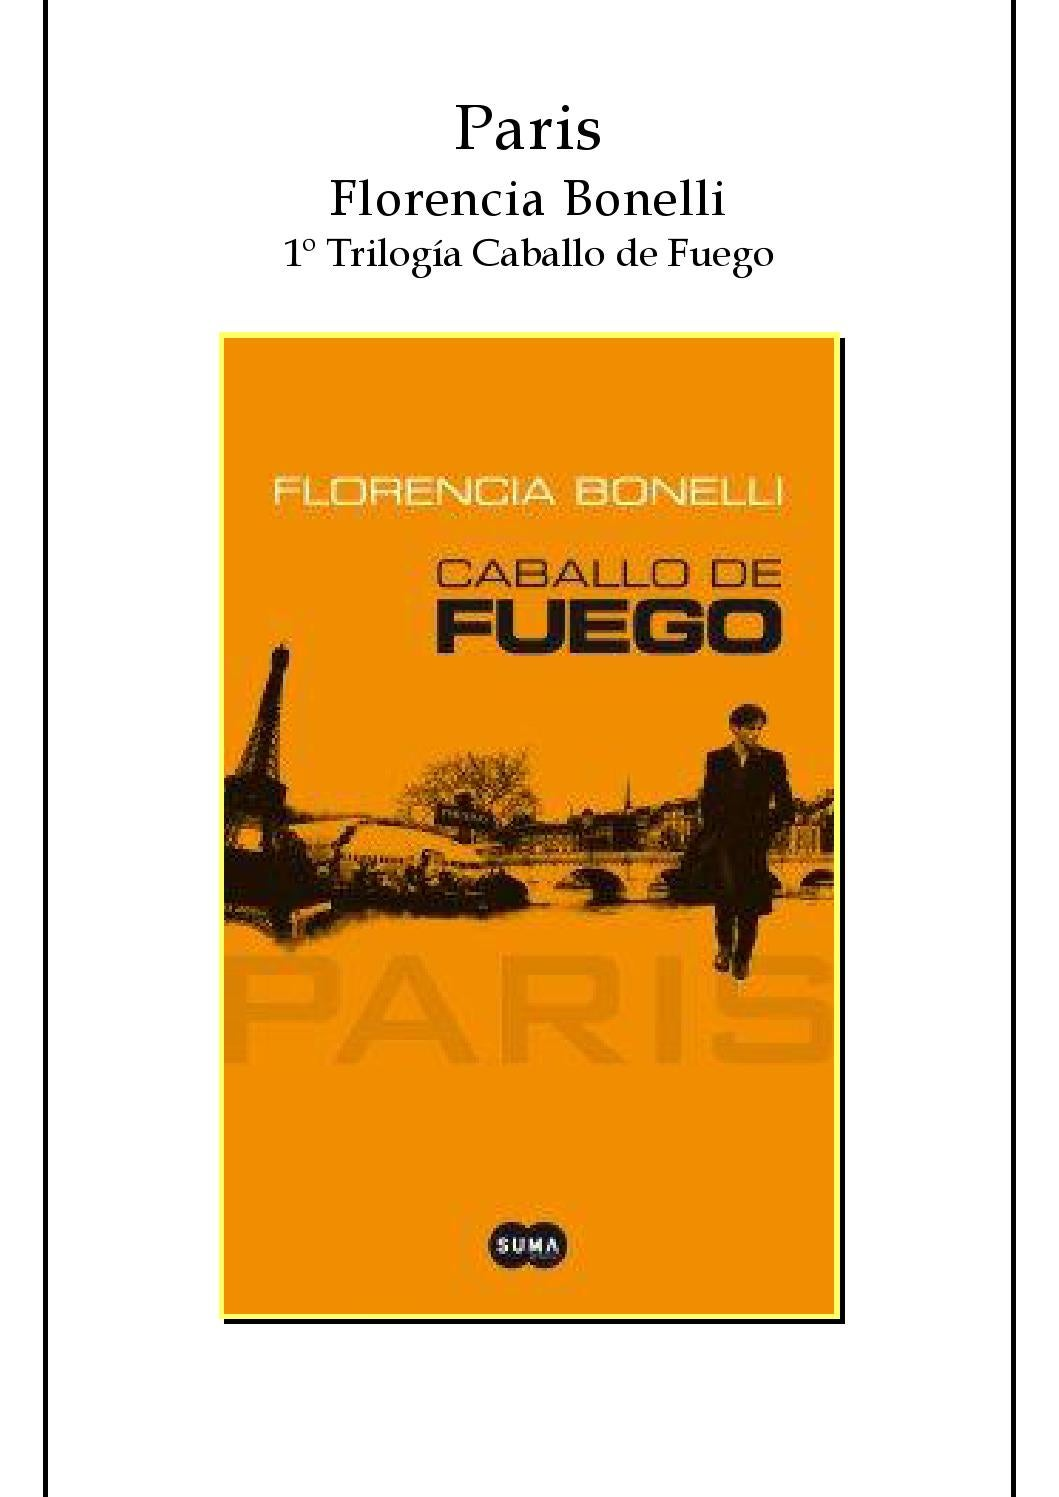 Clip de Corbata Conjunto de Regalo Insignia de Solapa RAF Gemelos de comando de transporte